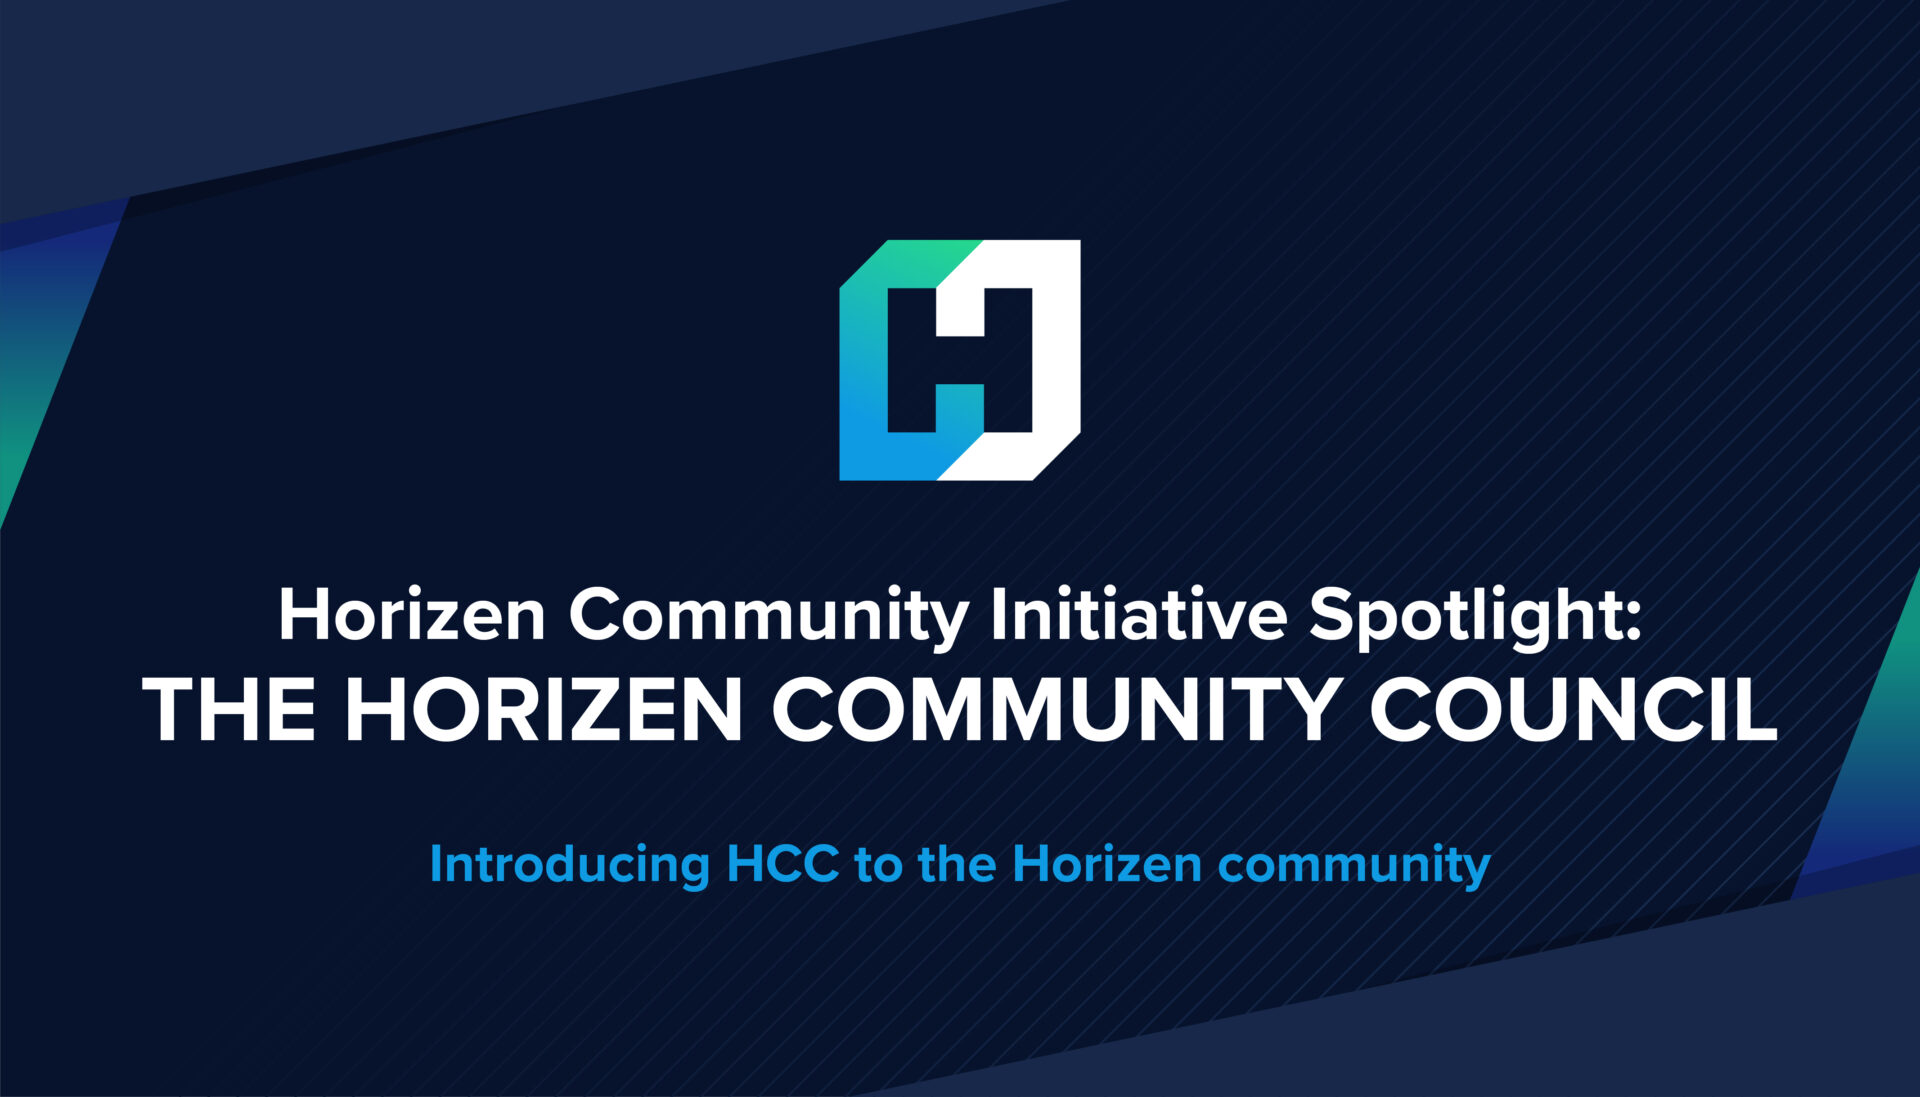 Horizen Community Initiative Spotlight: The Horizen Community Council - Horizen